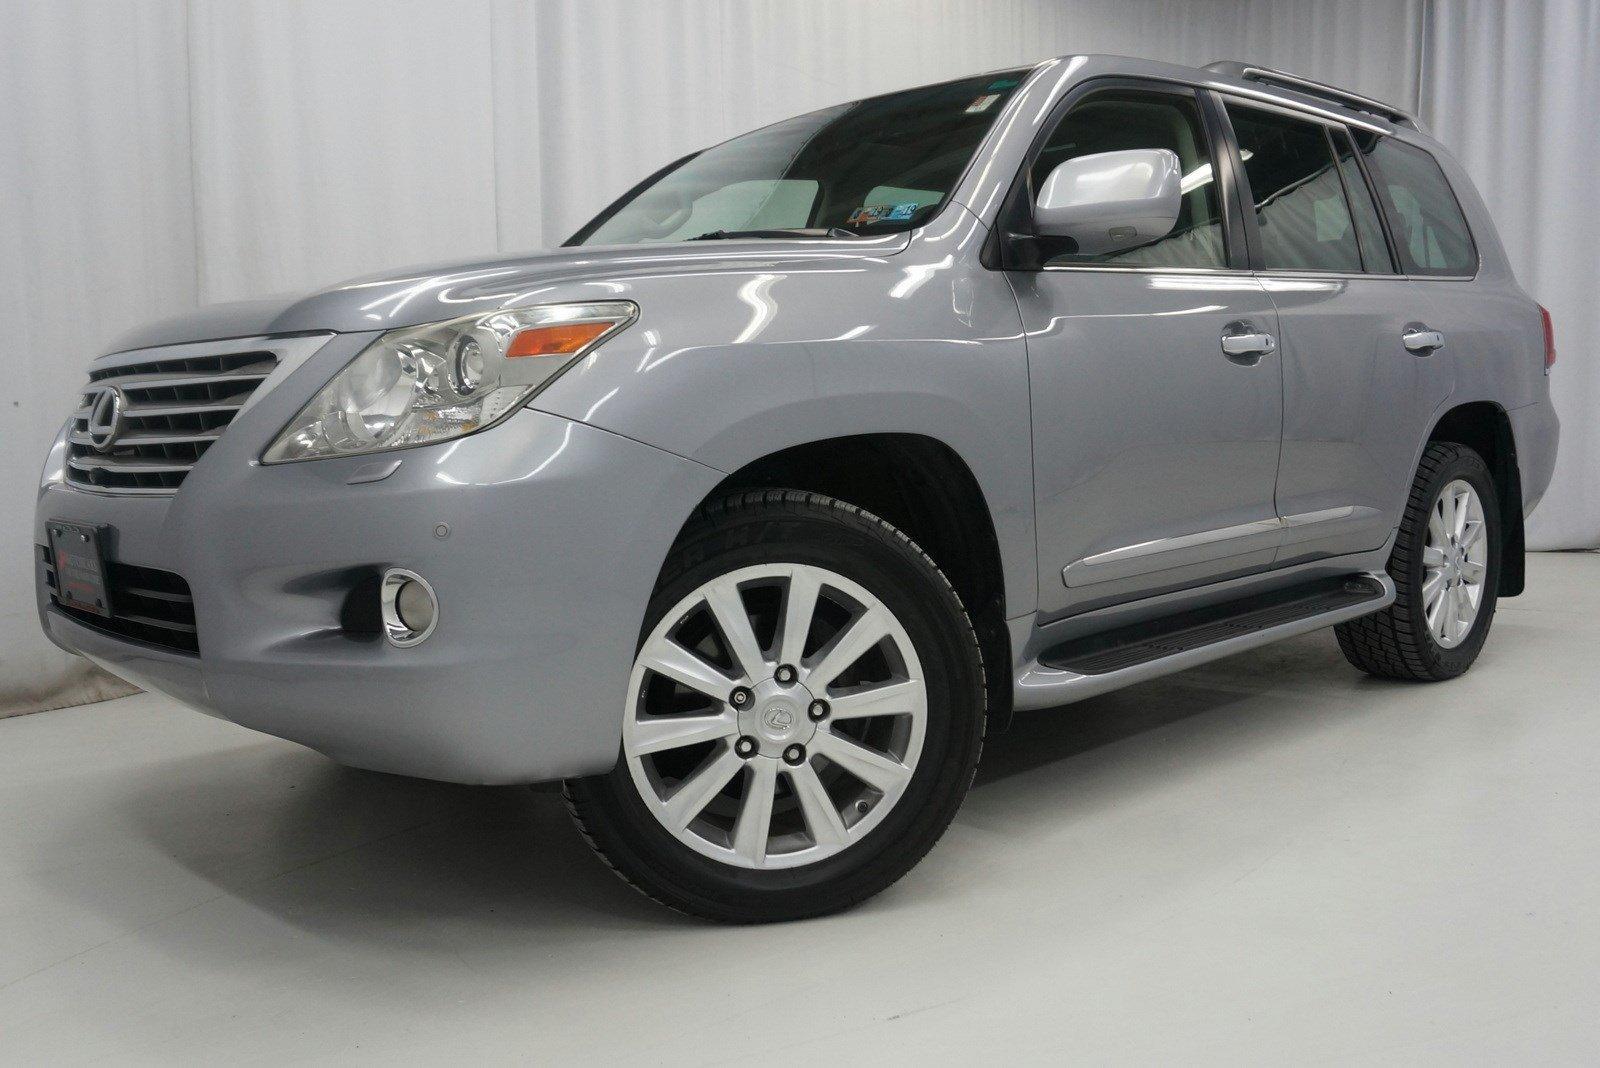 https://www.motorcarsofthemainline.com/imagetag/2512/main/l/Used-2008-Lexus-LX-570.jpg